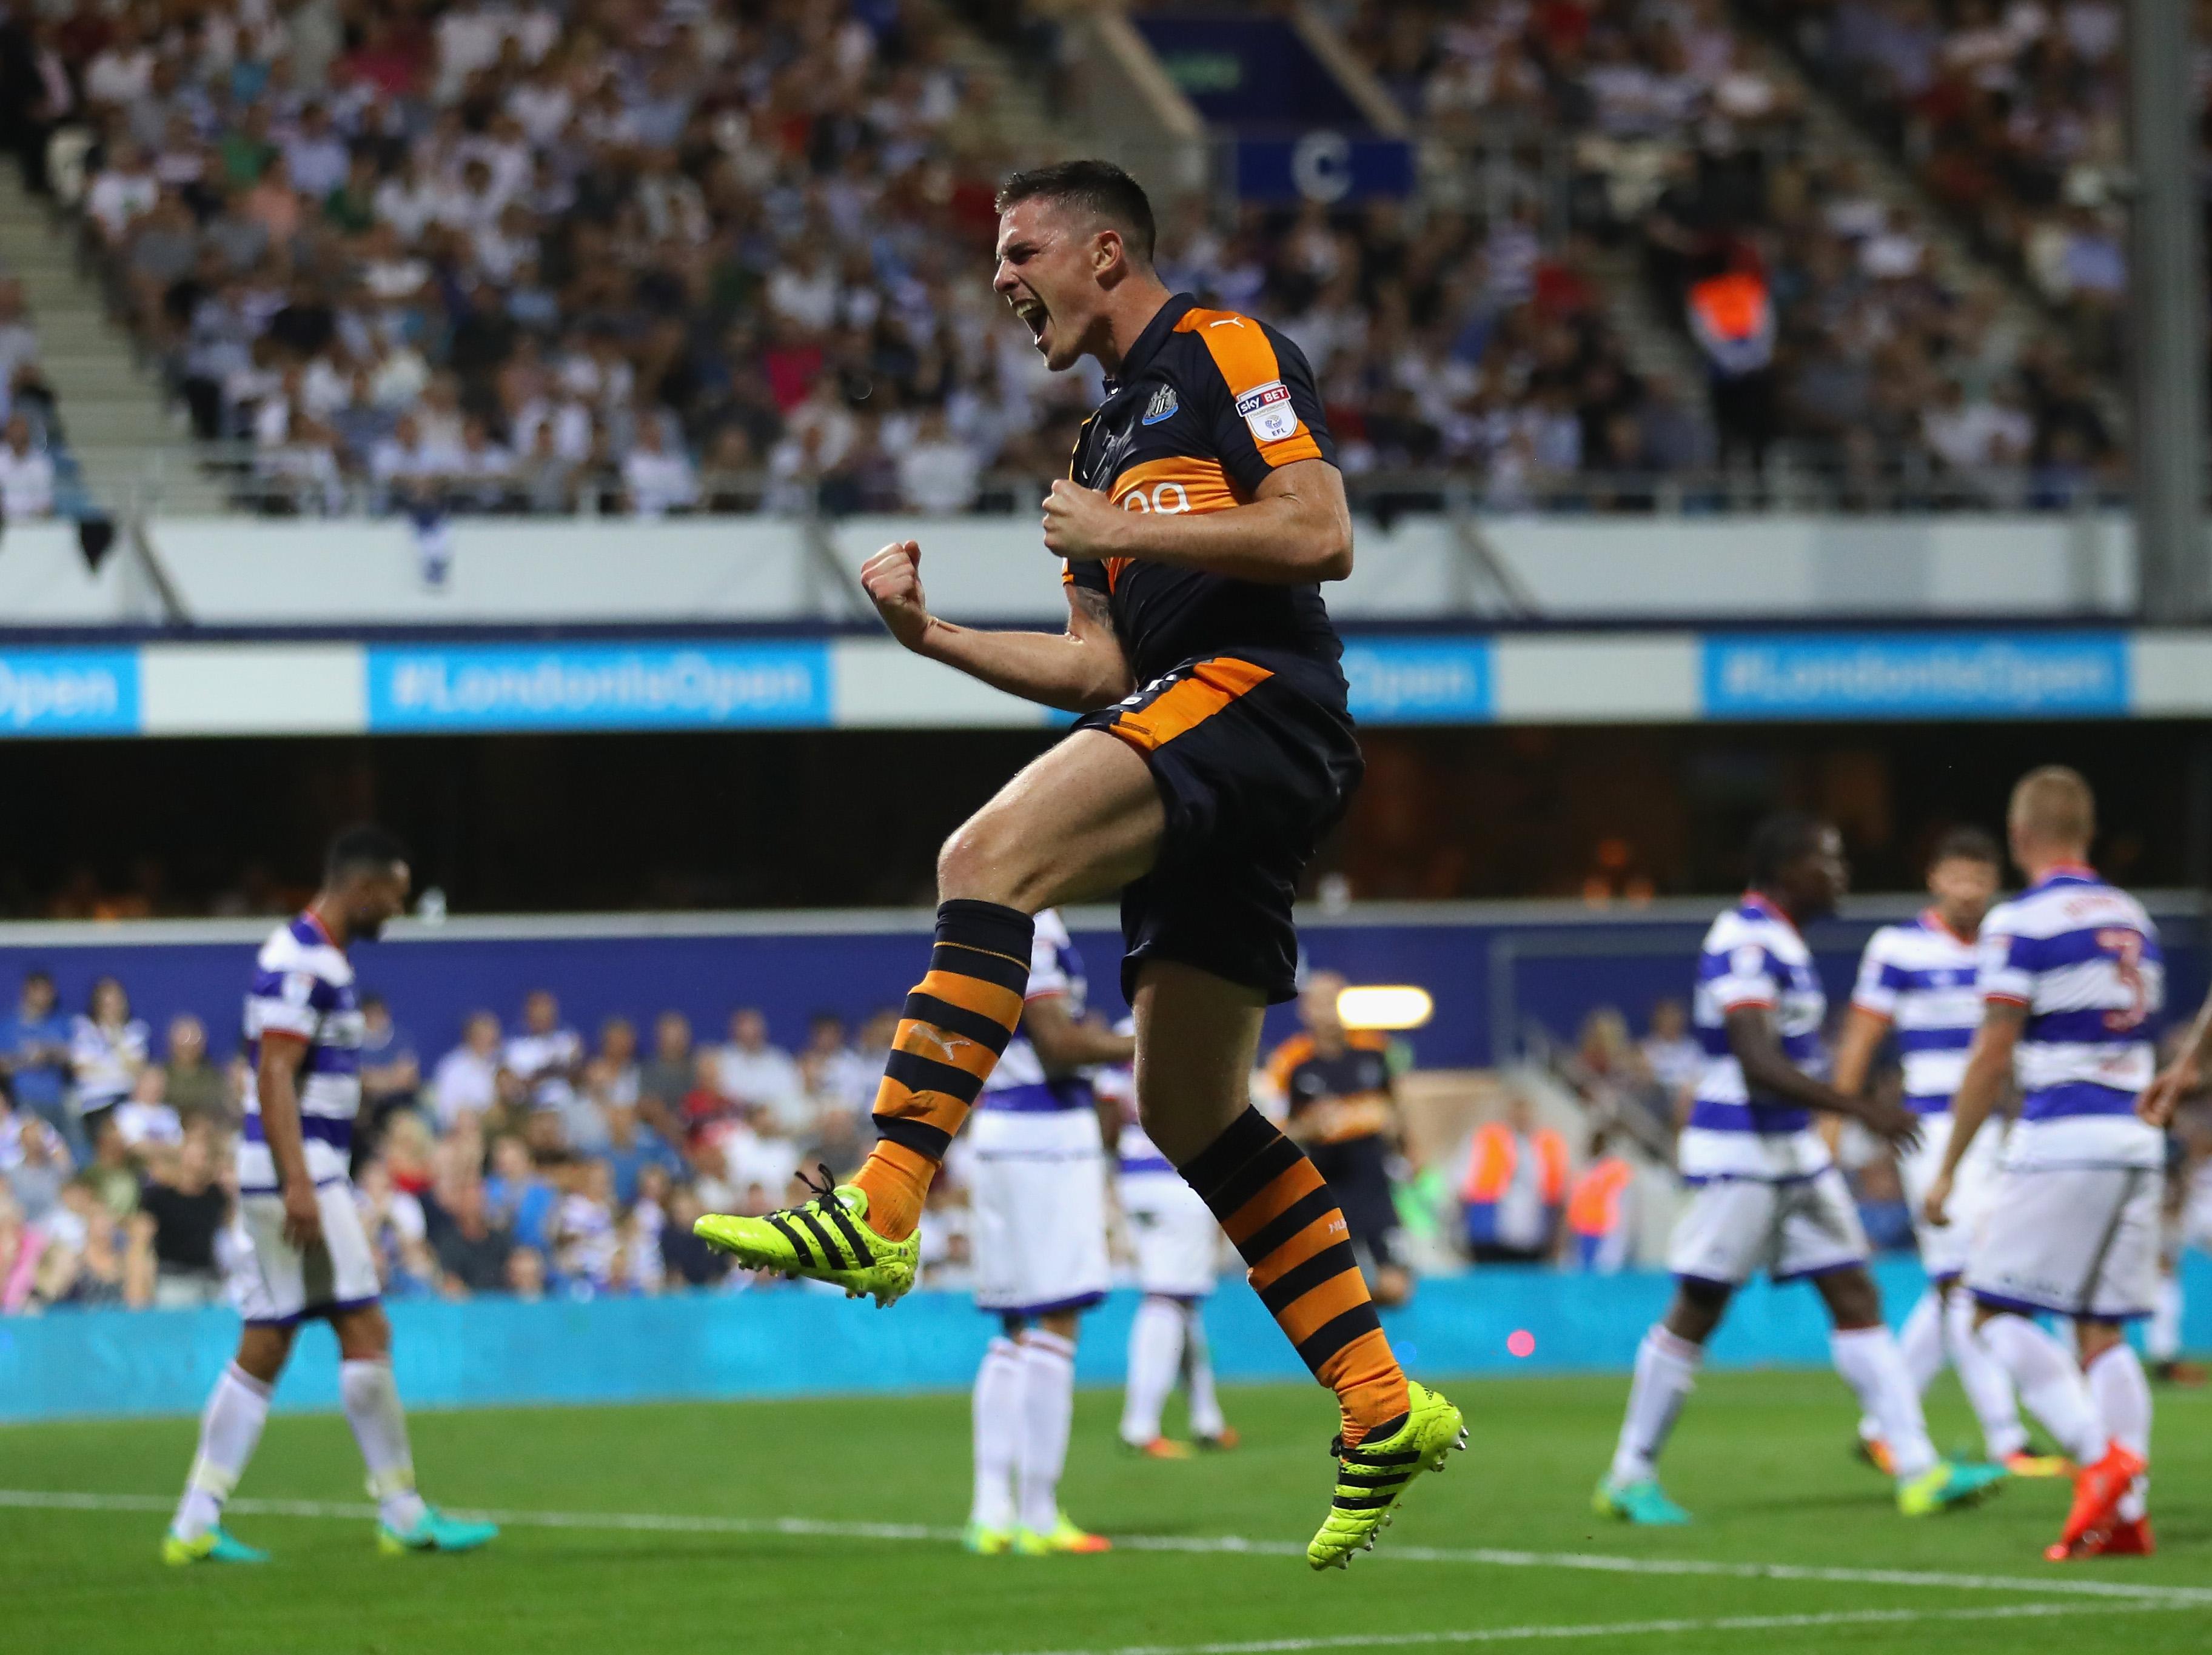 Newcastle United's Ciaran Clark on Rafa's Rotation Policy